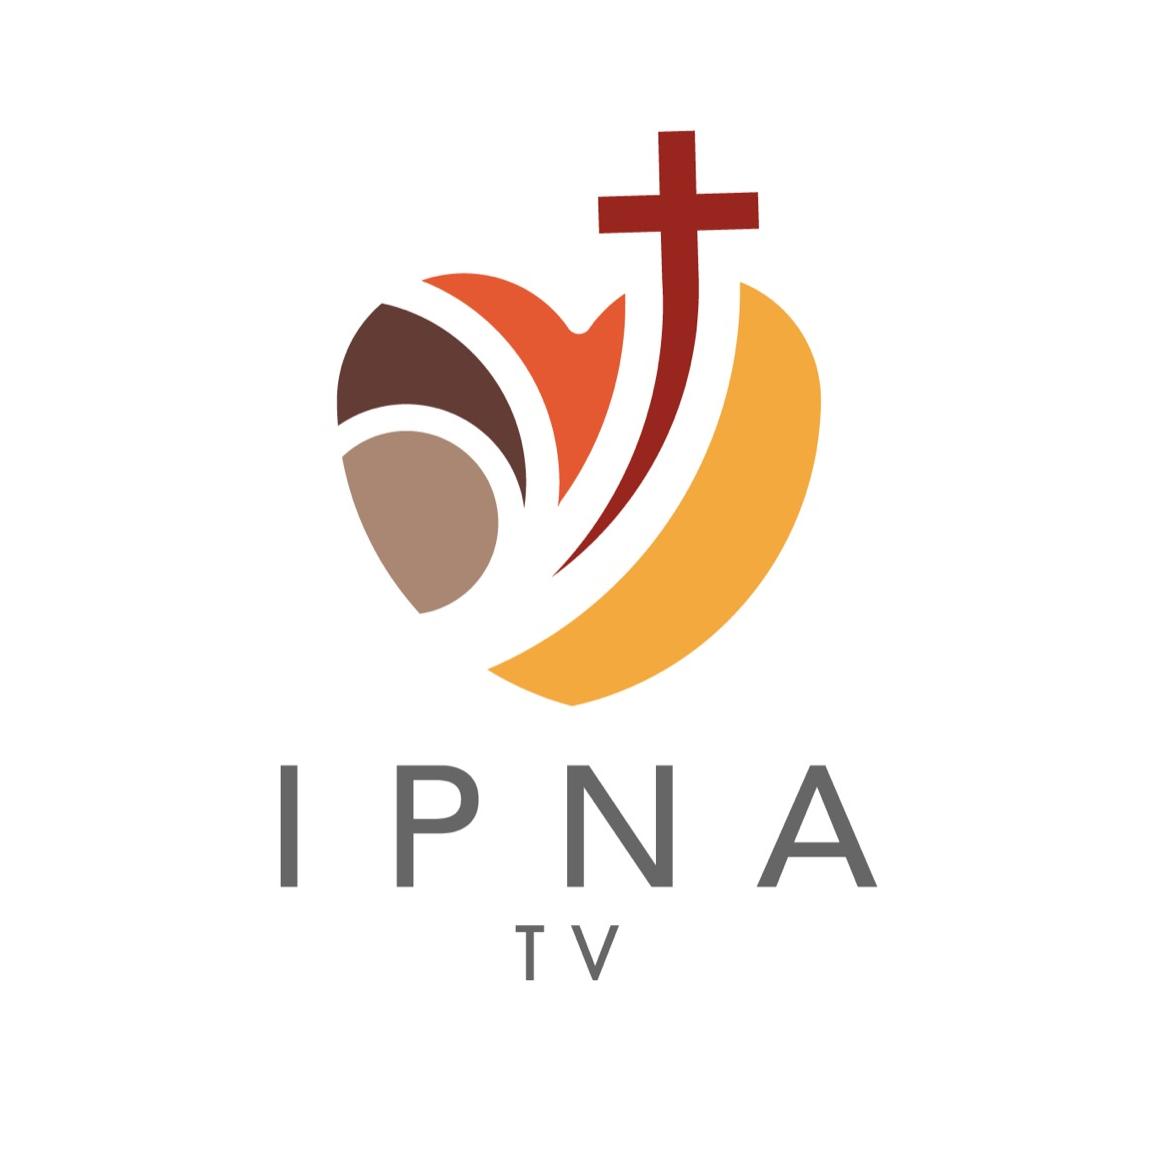 IPNA TV CHILE